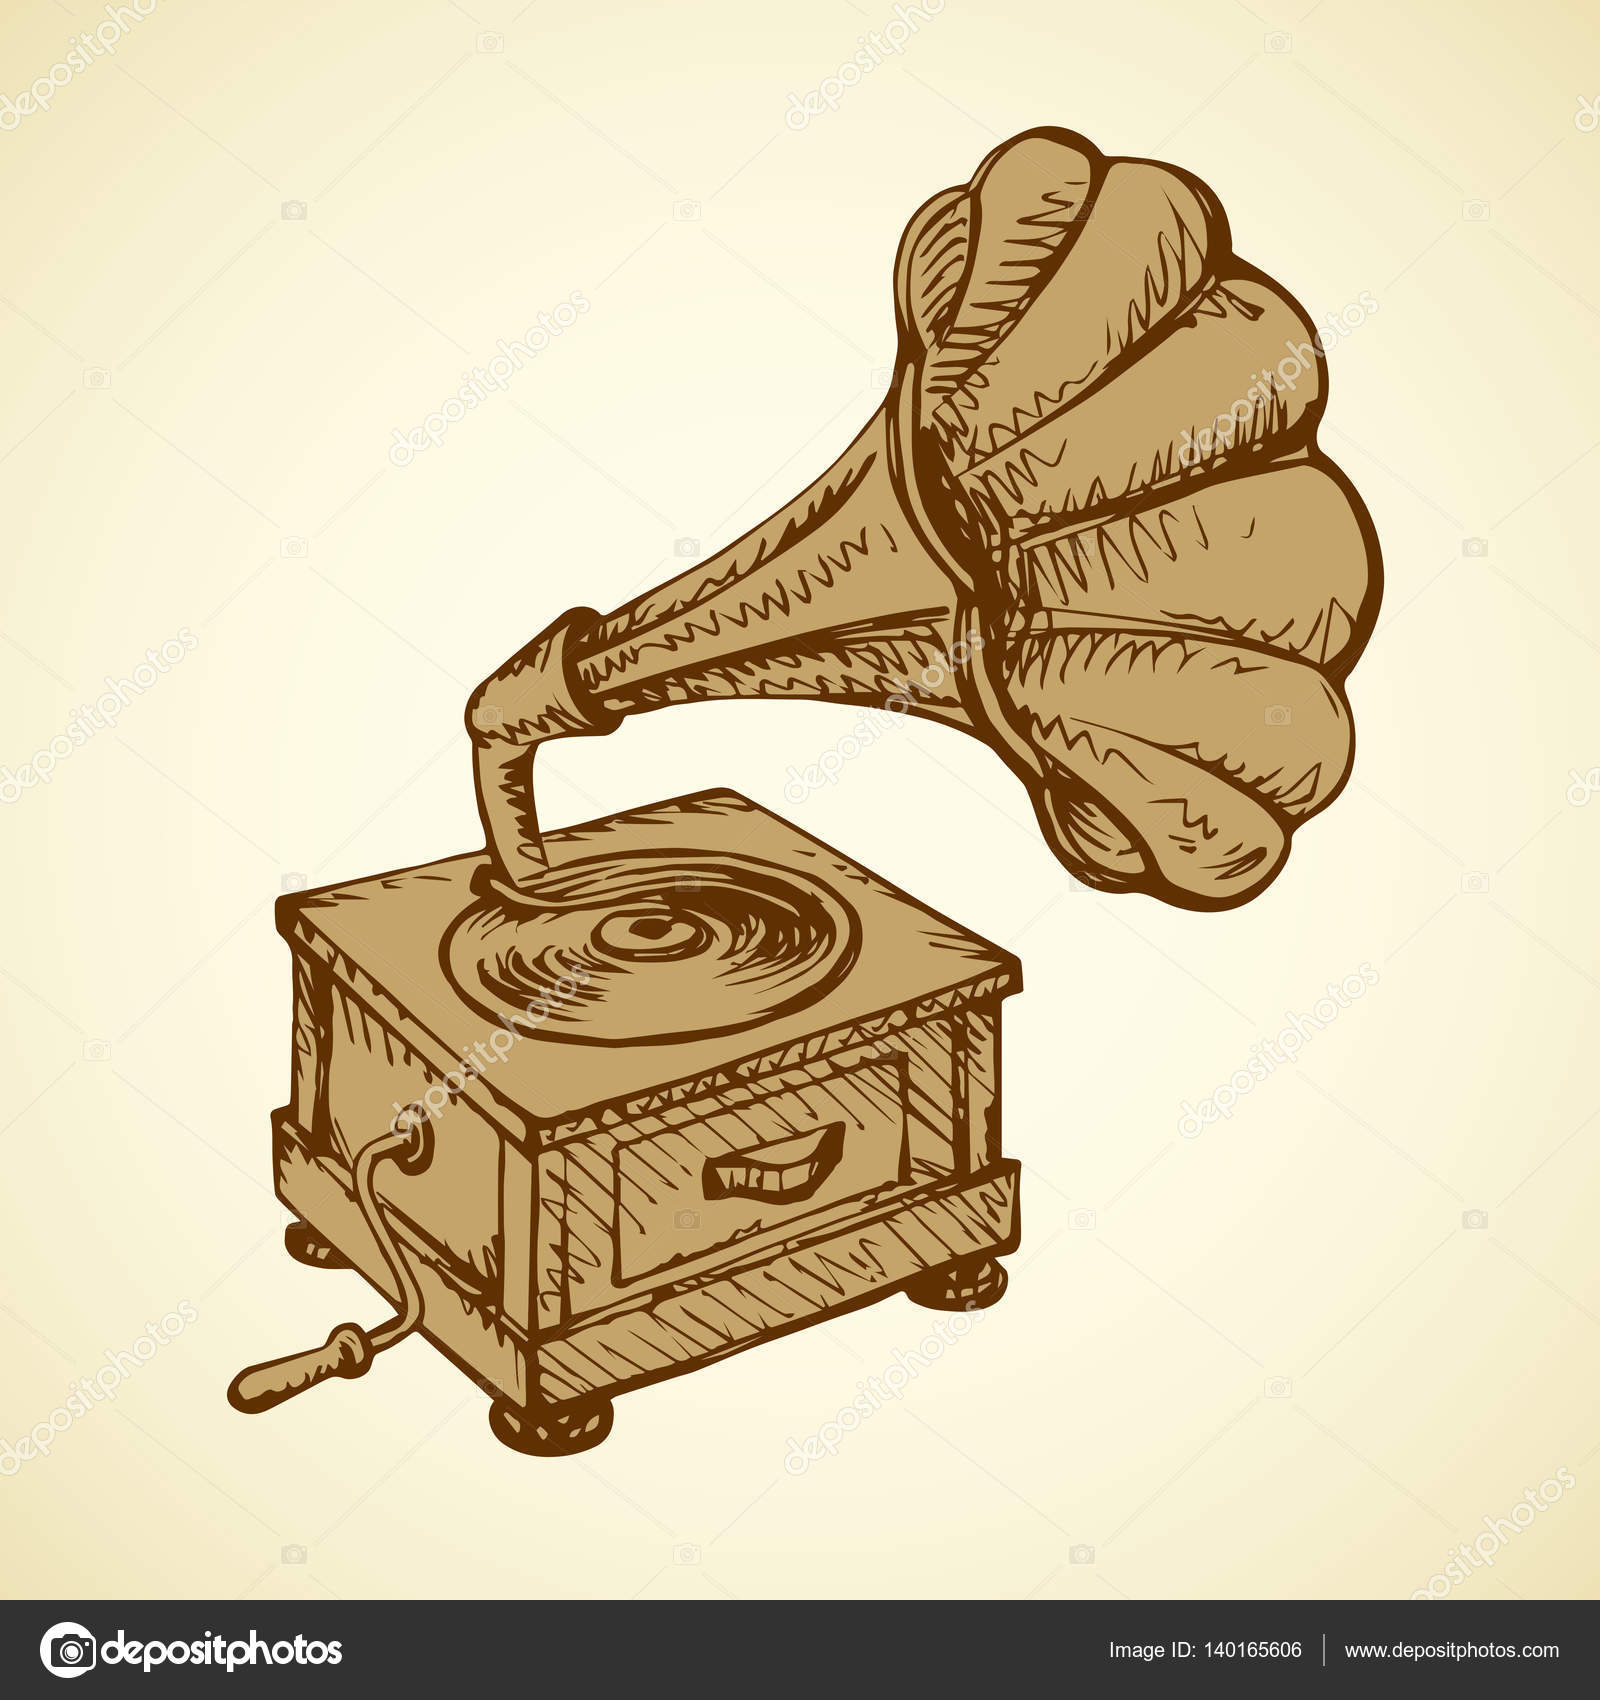 gramophone vector drawing stock vector c marinka 140165606 gramophone vector drawing stock vector c marinka 140165606